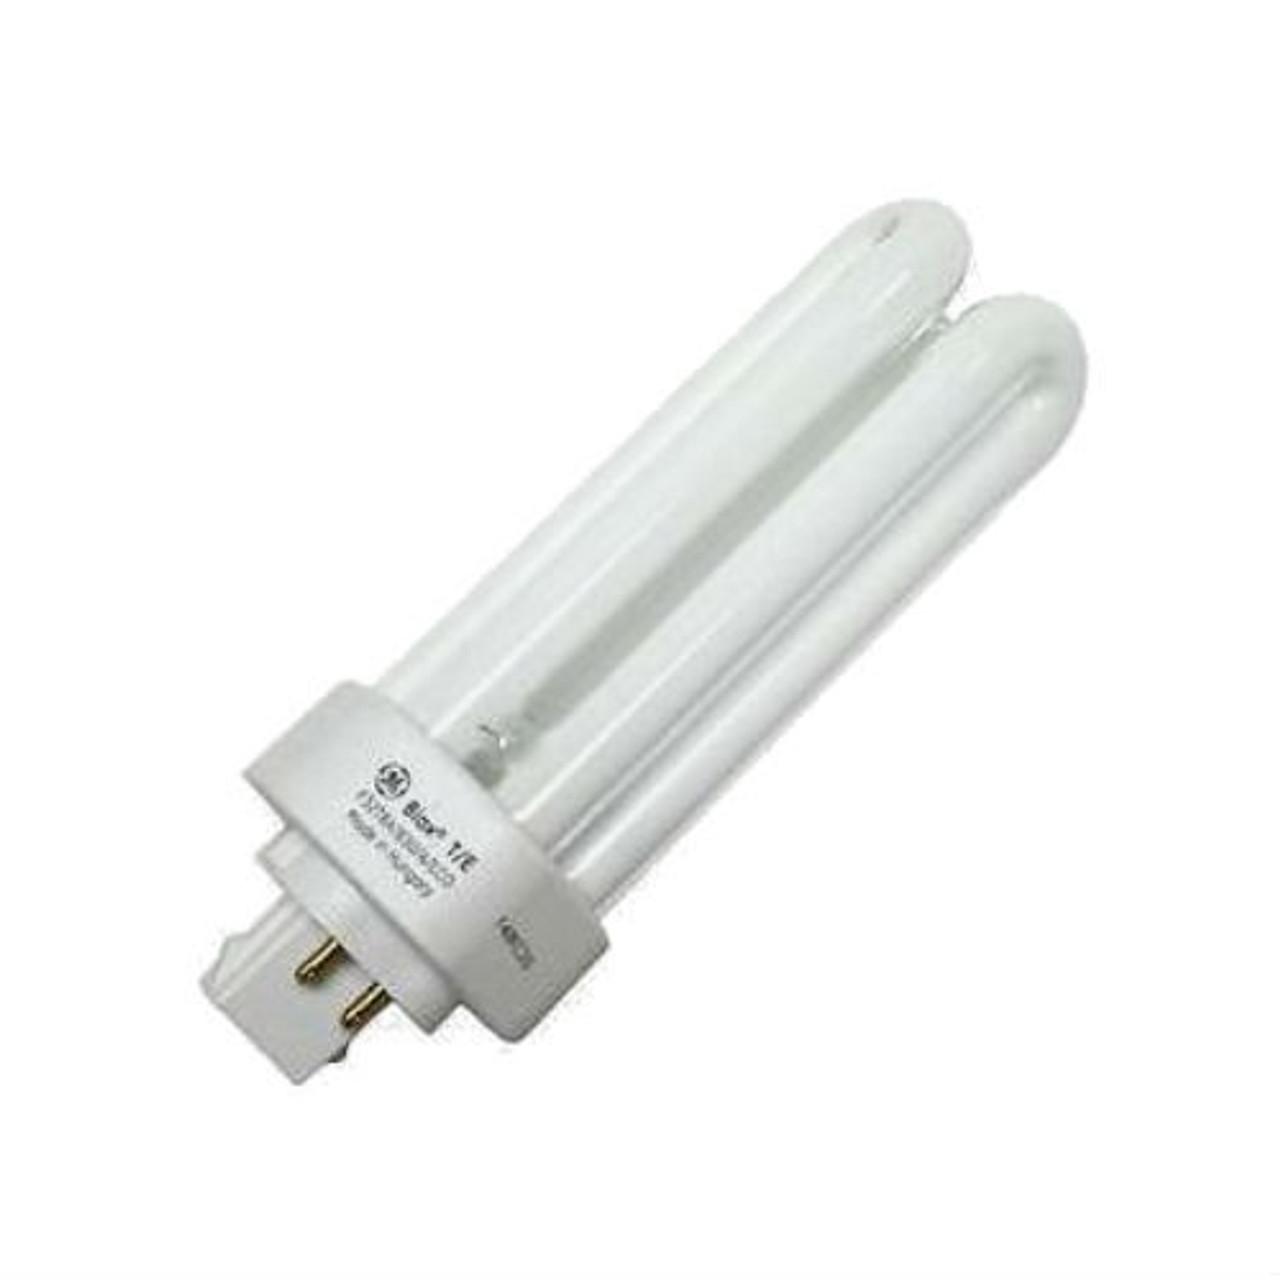 GE 71443 GEC226-MVPS-BES Compact Fluorescent Ballast